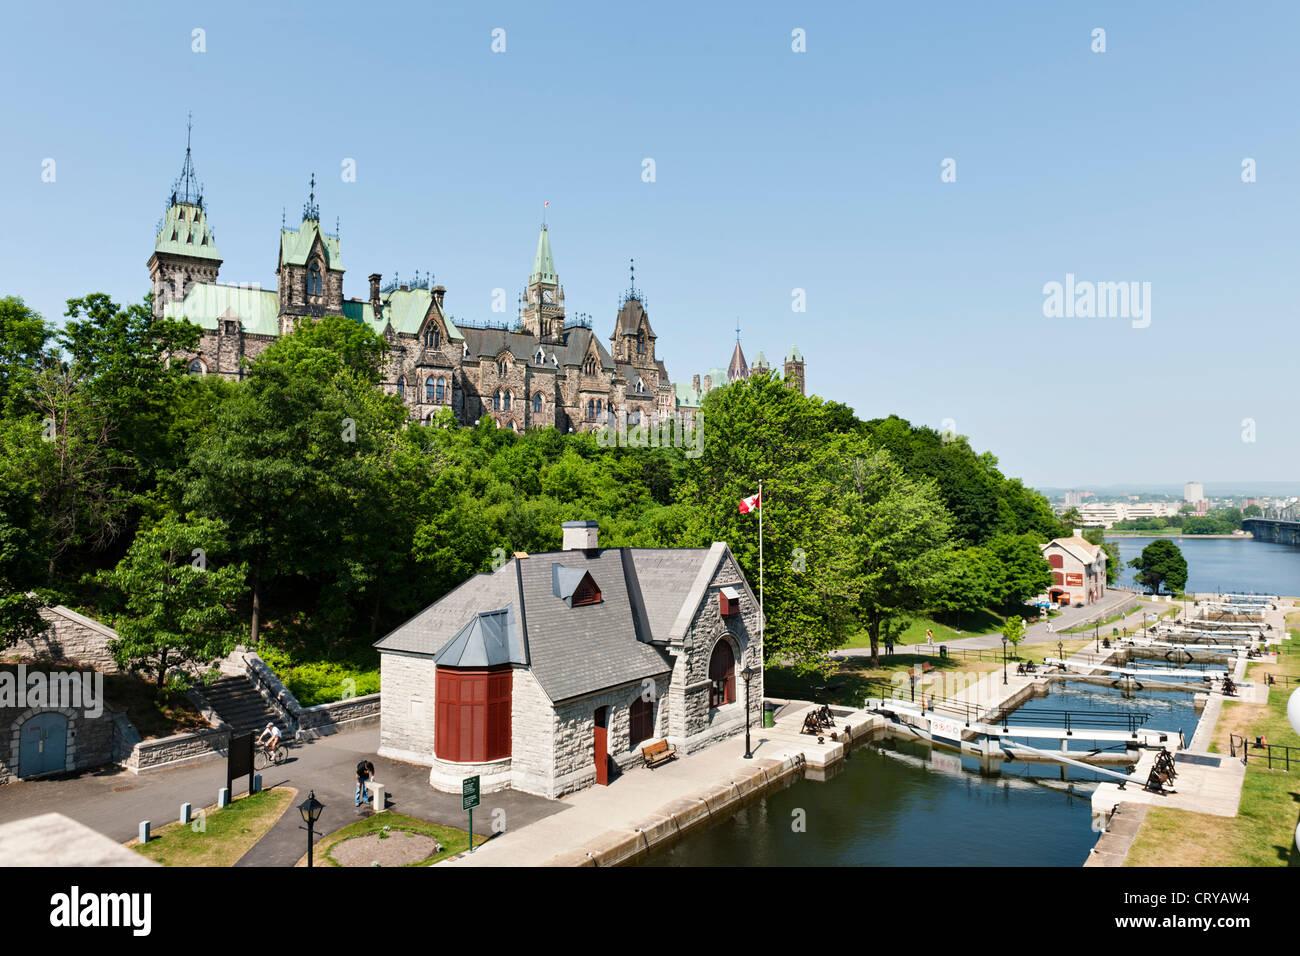 Parliament Hill, Ottawa River lock, Rideau canal - Stock Image